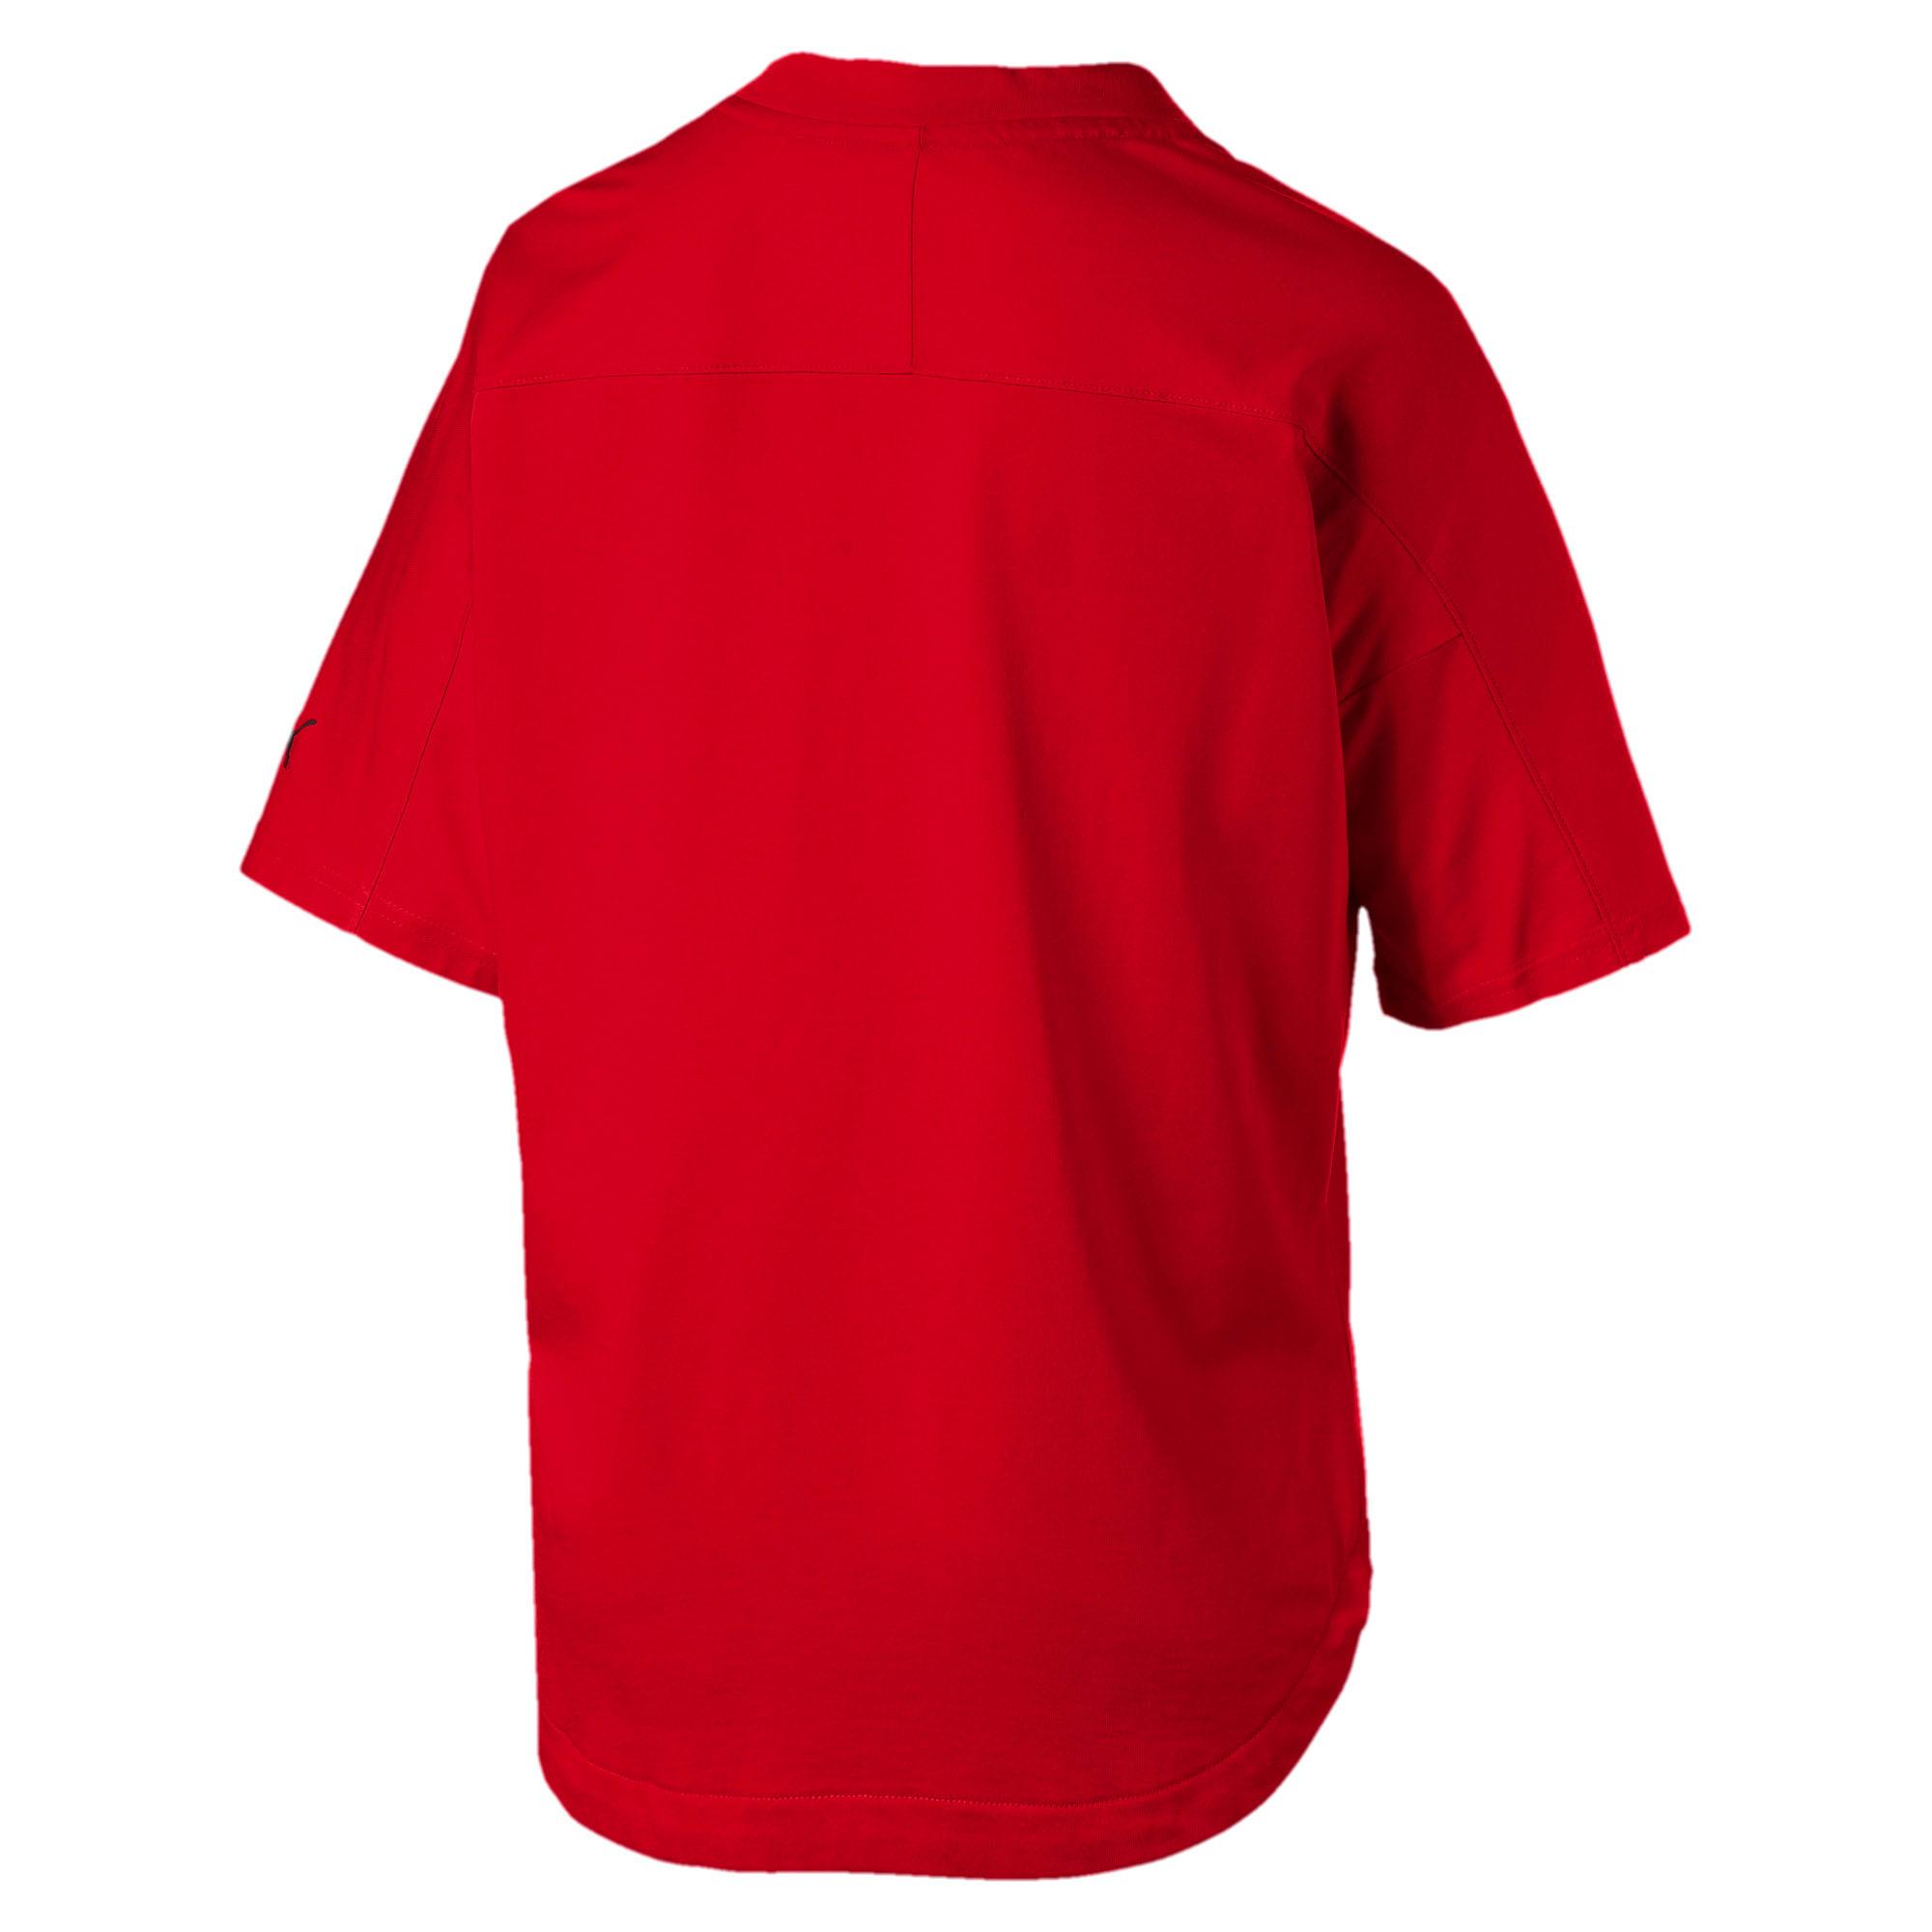 Thumbnail 5 of T-shirt con stemma grande Ferrari donna, Rosso Corsa, medium